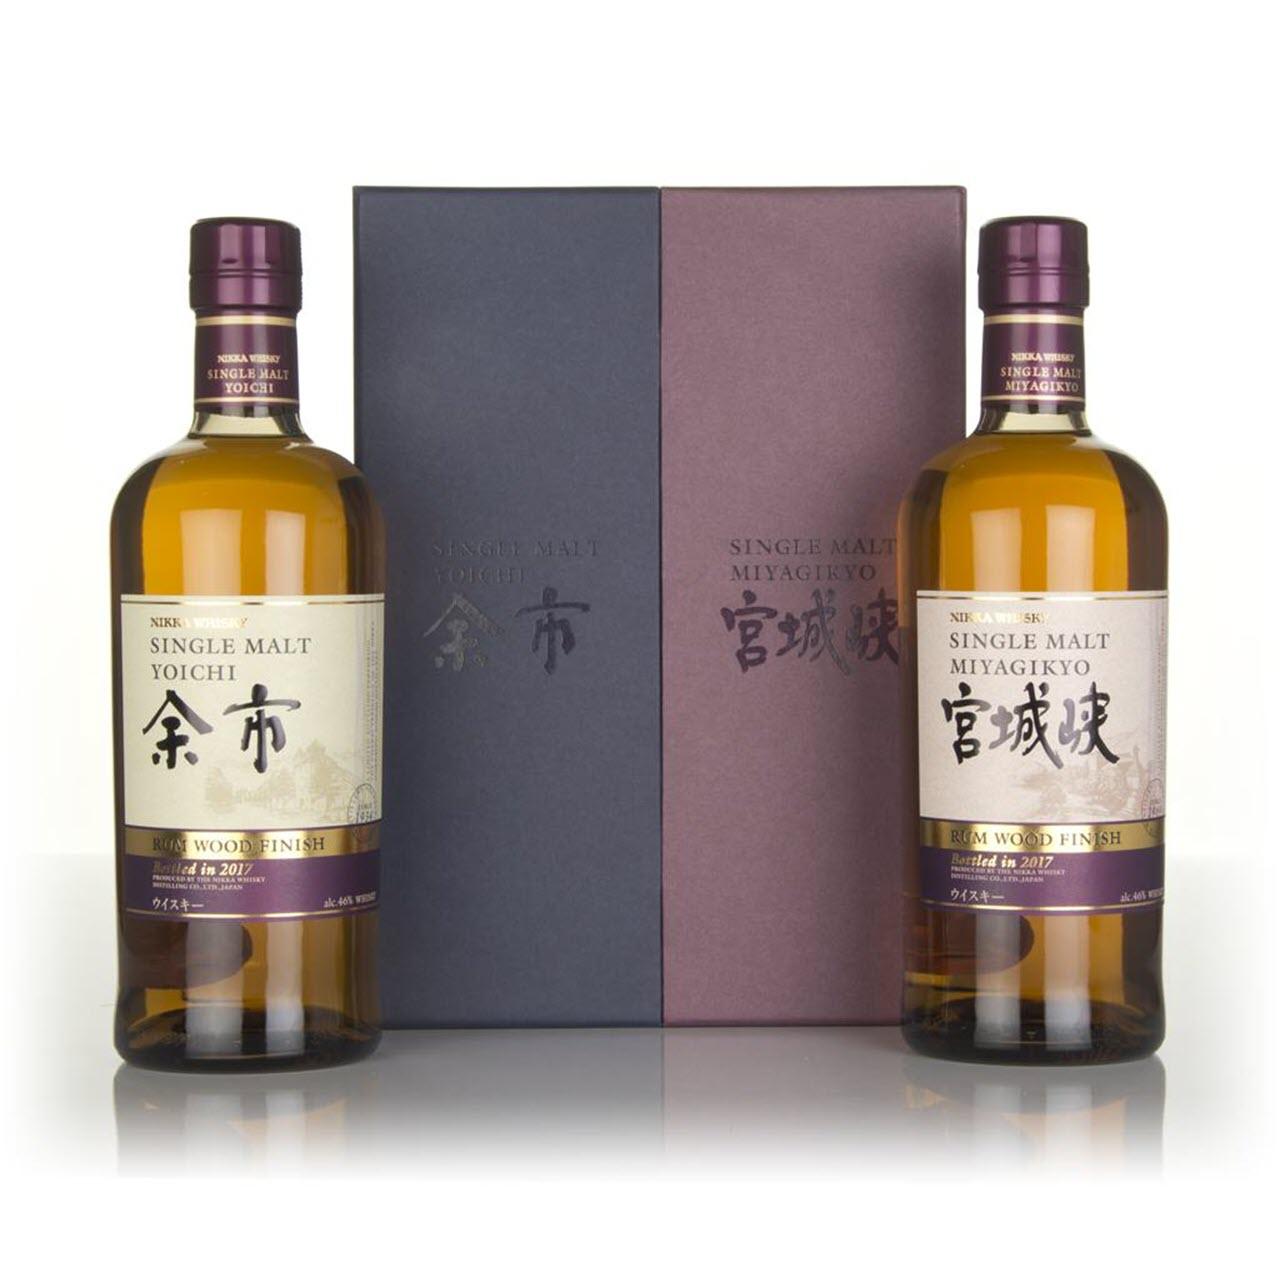 Miyagikyo and Yoichi Rum Cask Finish 2017